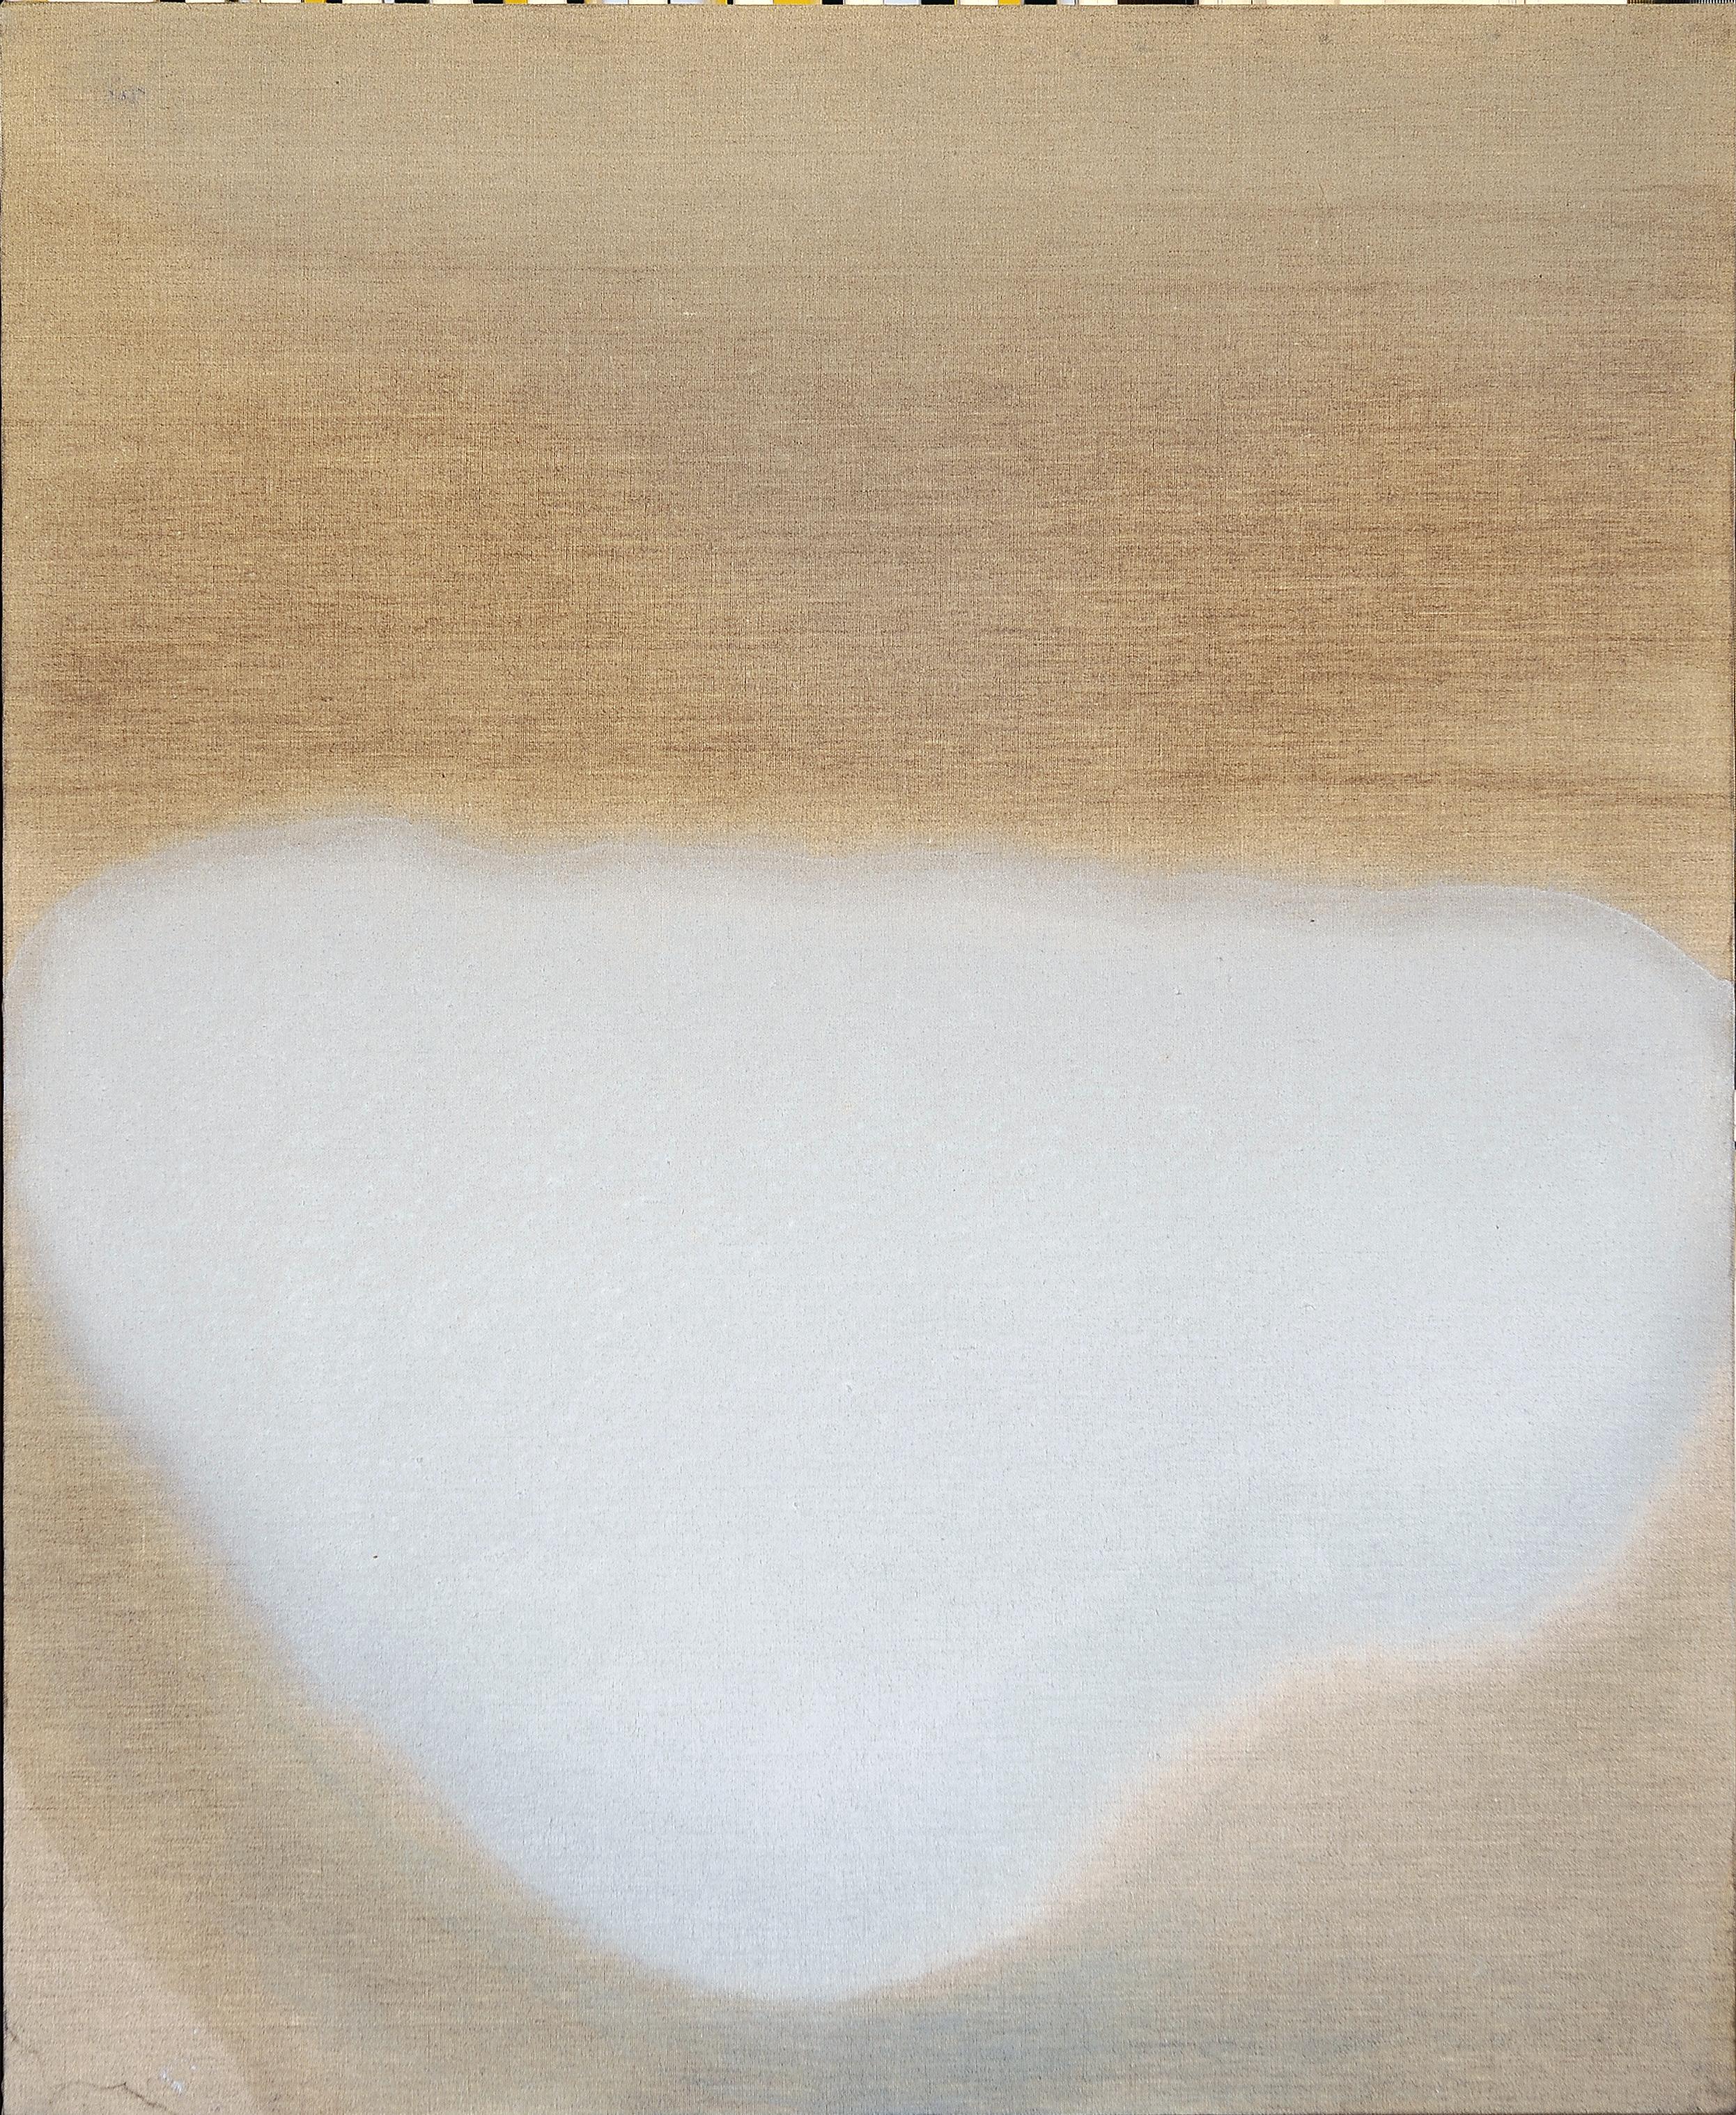 14 ottobre,2008, olio su tela, cm 110 x 90  14 ottobre, 2008, oil on canvas, cm 110 x 90